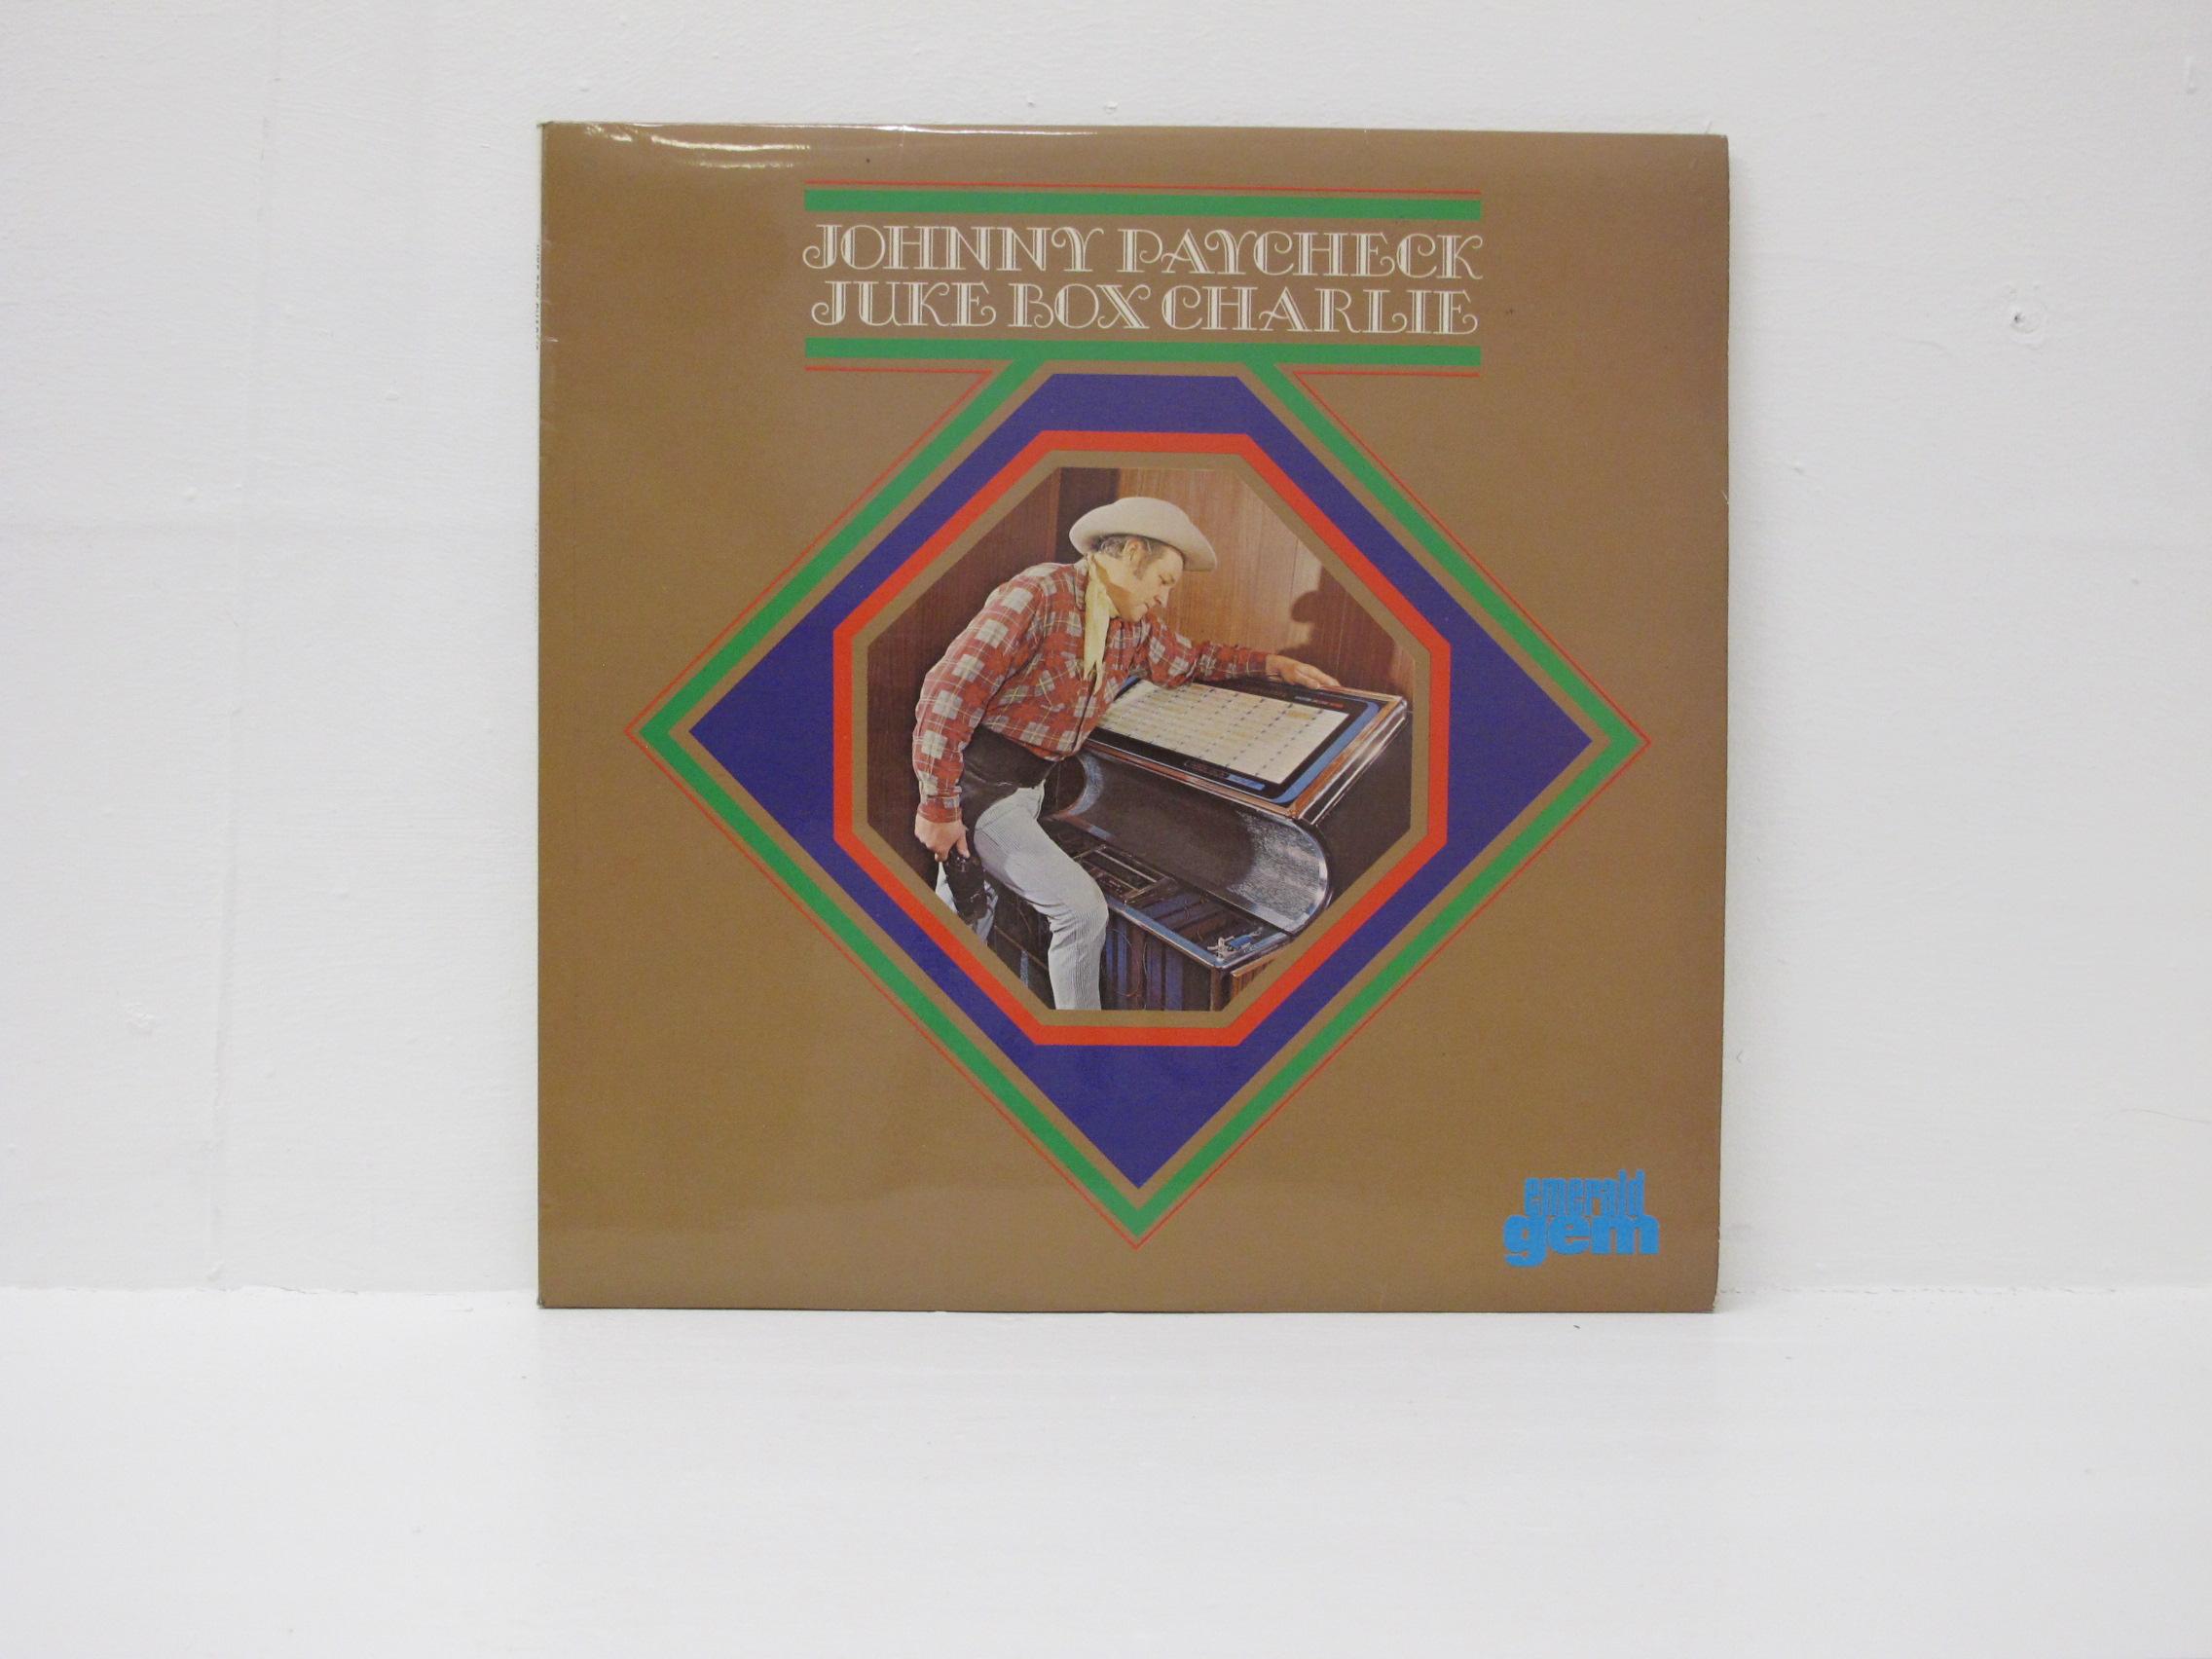 Johny Paycheck - Juke Box Charlie